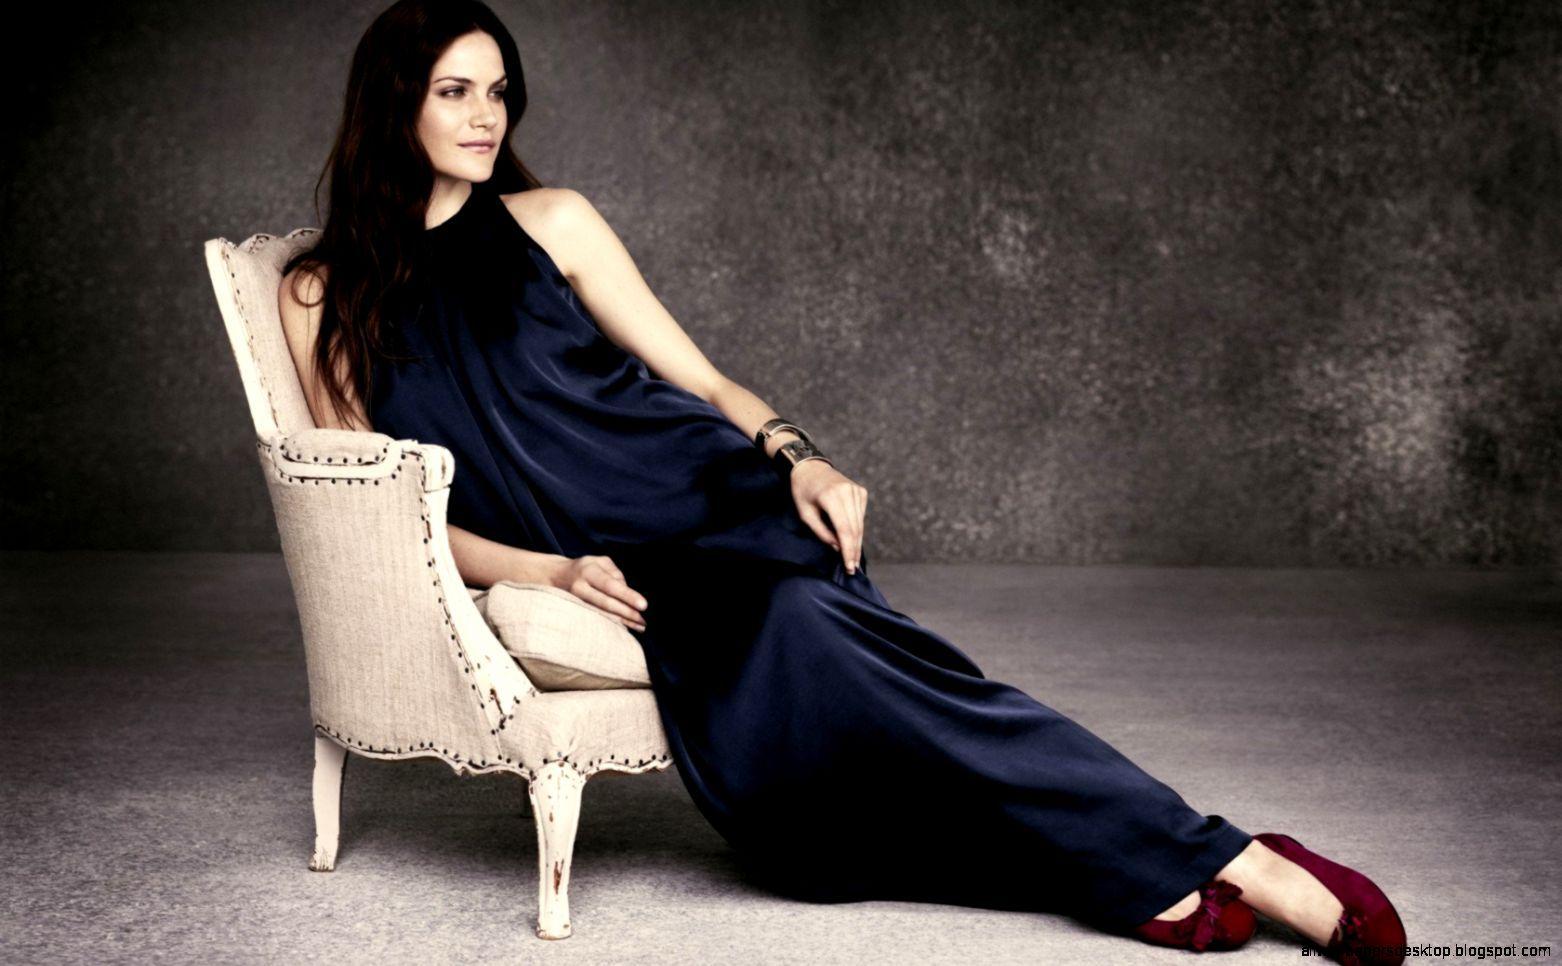 Fashion Girl Dress Model Sit Chair Hd Wallpapers (1562×966) | Fashion /  Chair / Shoes | Pinterest